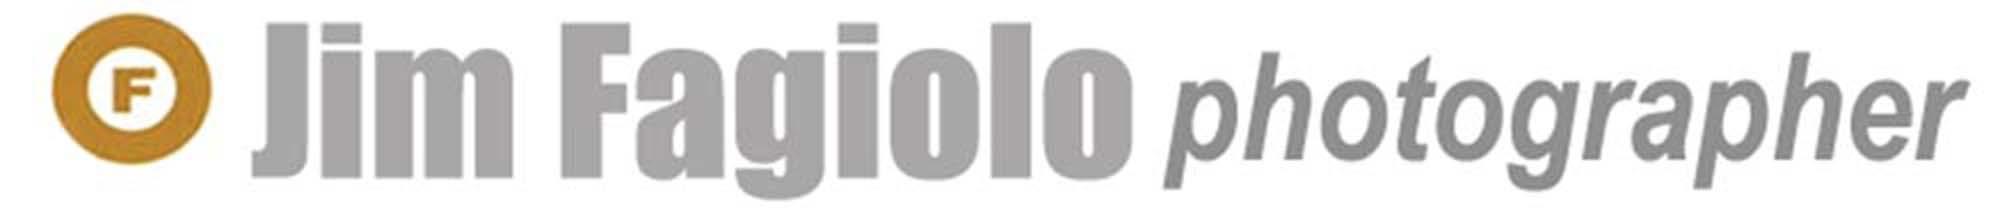 www.jimfagiolo.com